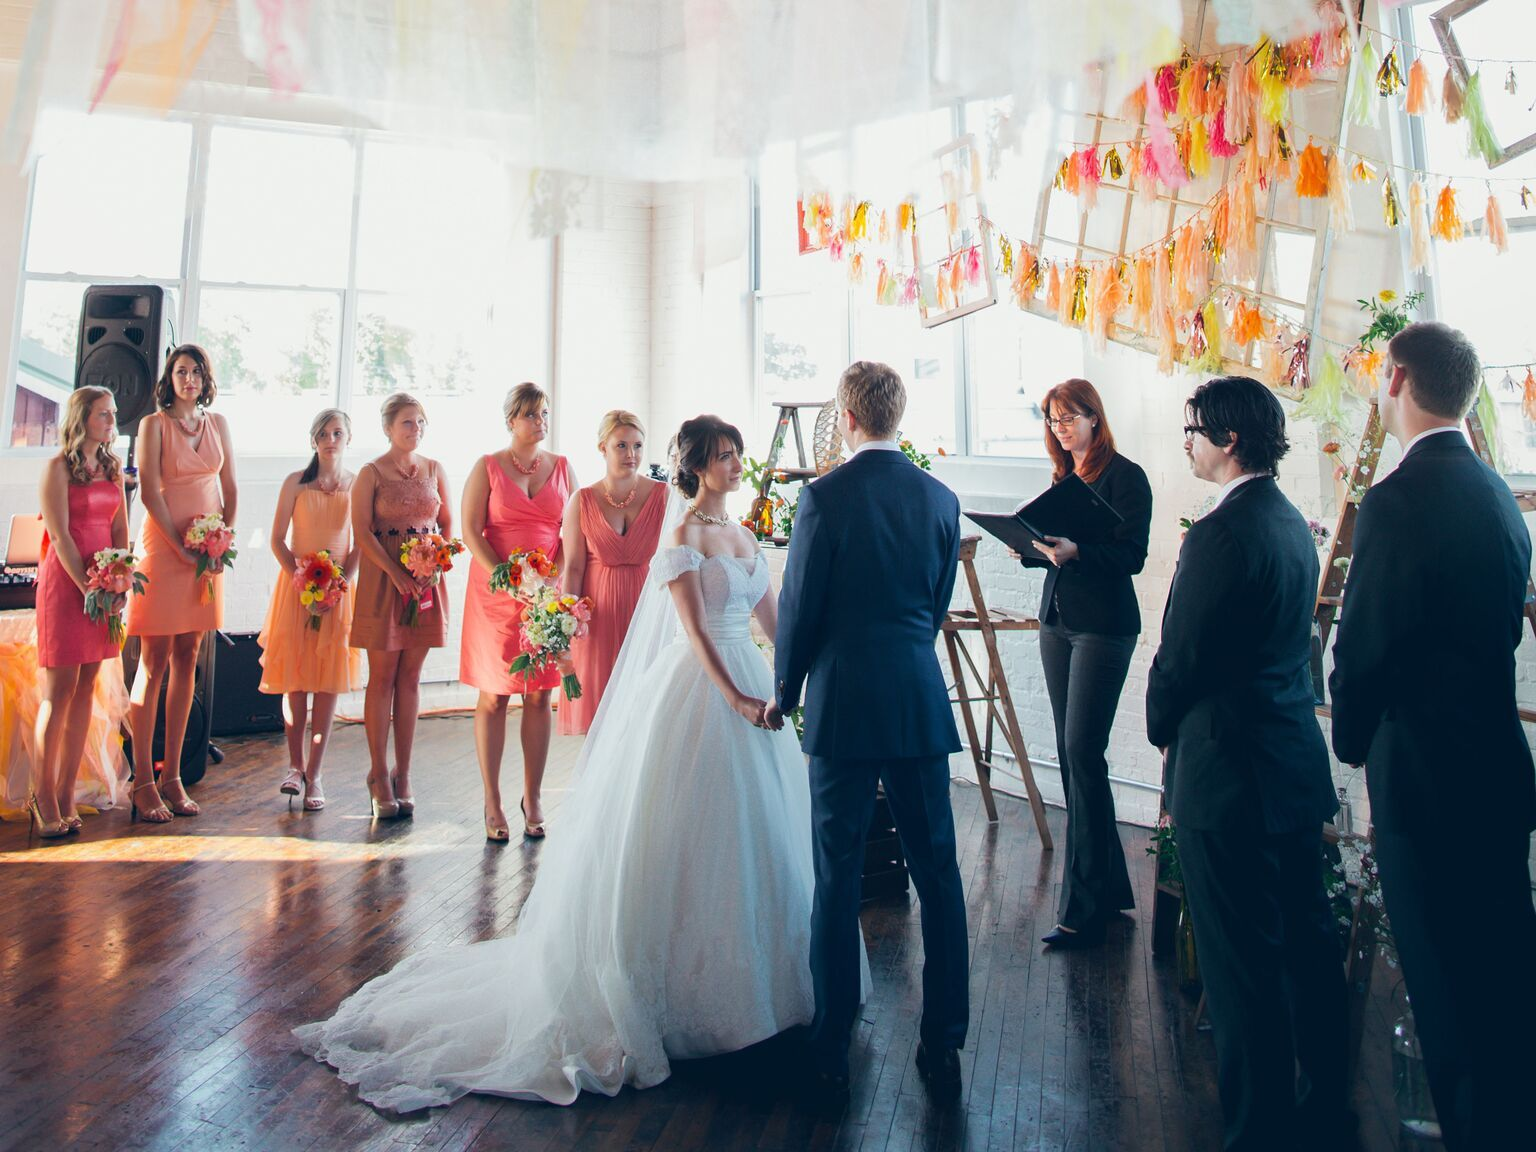 Protestant Wedding Ceremony Script In 2020 Wedding Ceremony Script Traditional Wedding Vows Ceremony